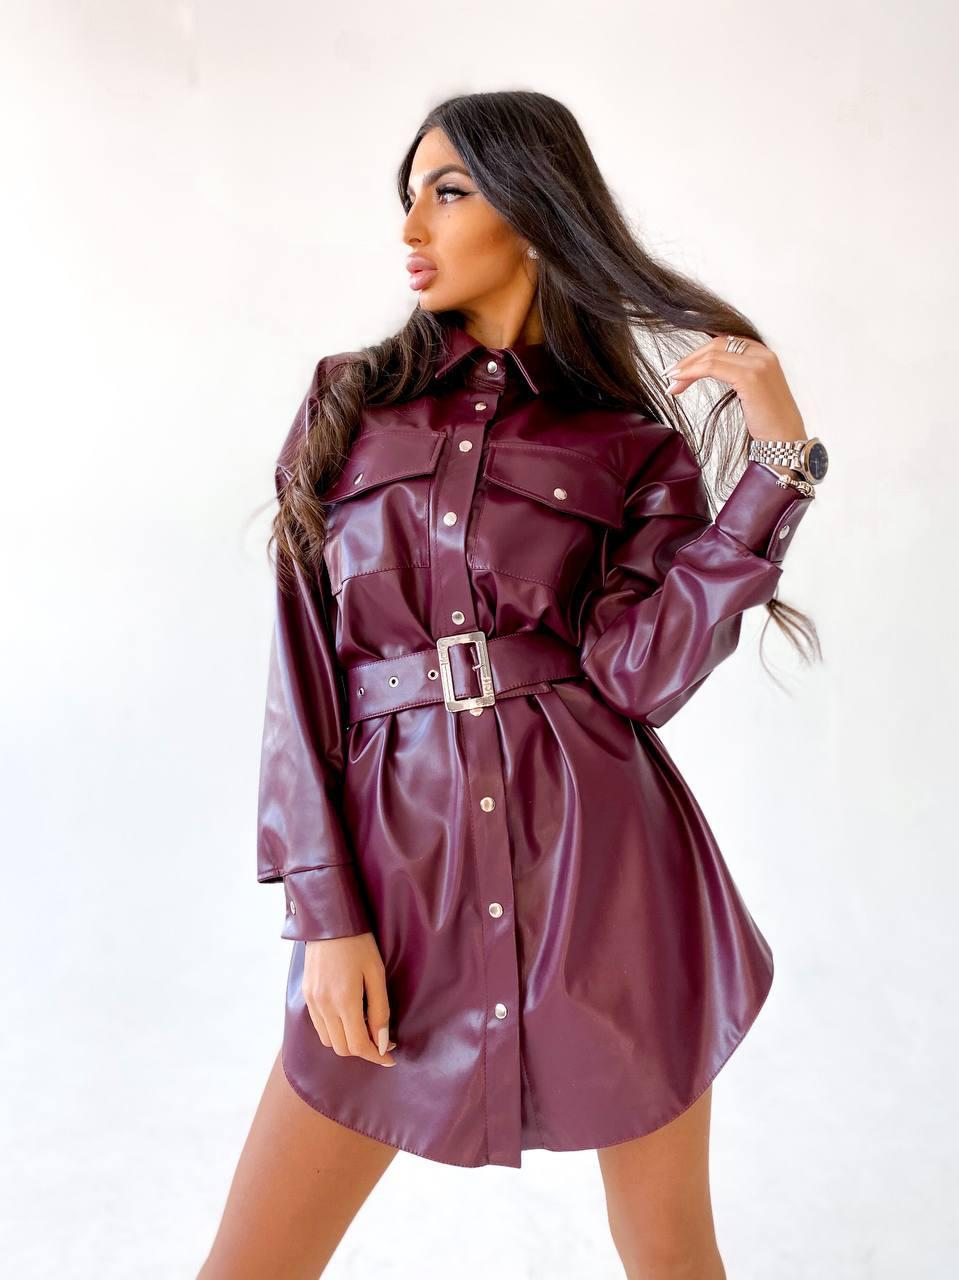 Трендовое  платье-рубашка на кнопках с широким поясом из экокожи Рremium purple flower